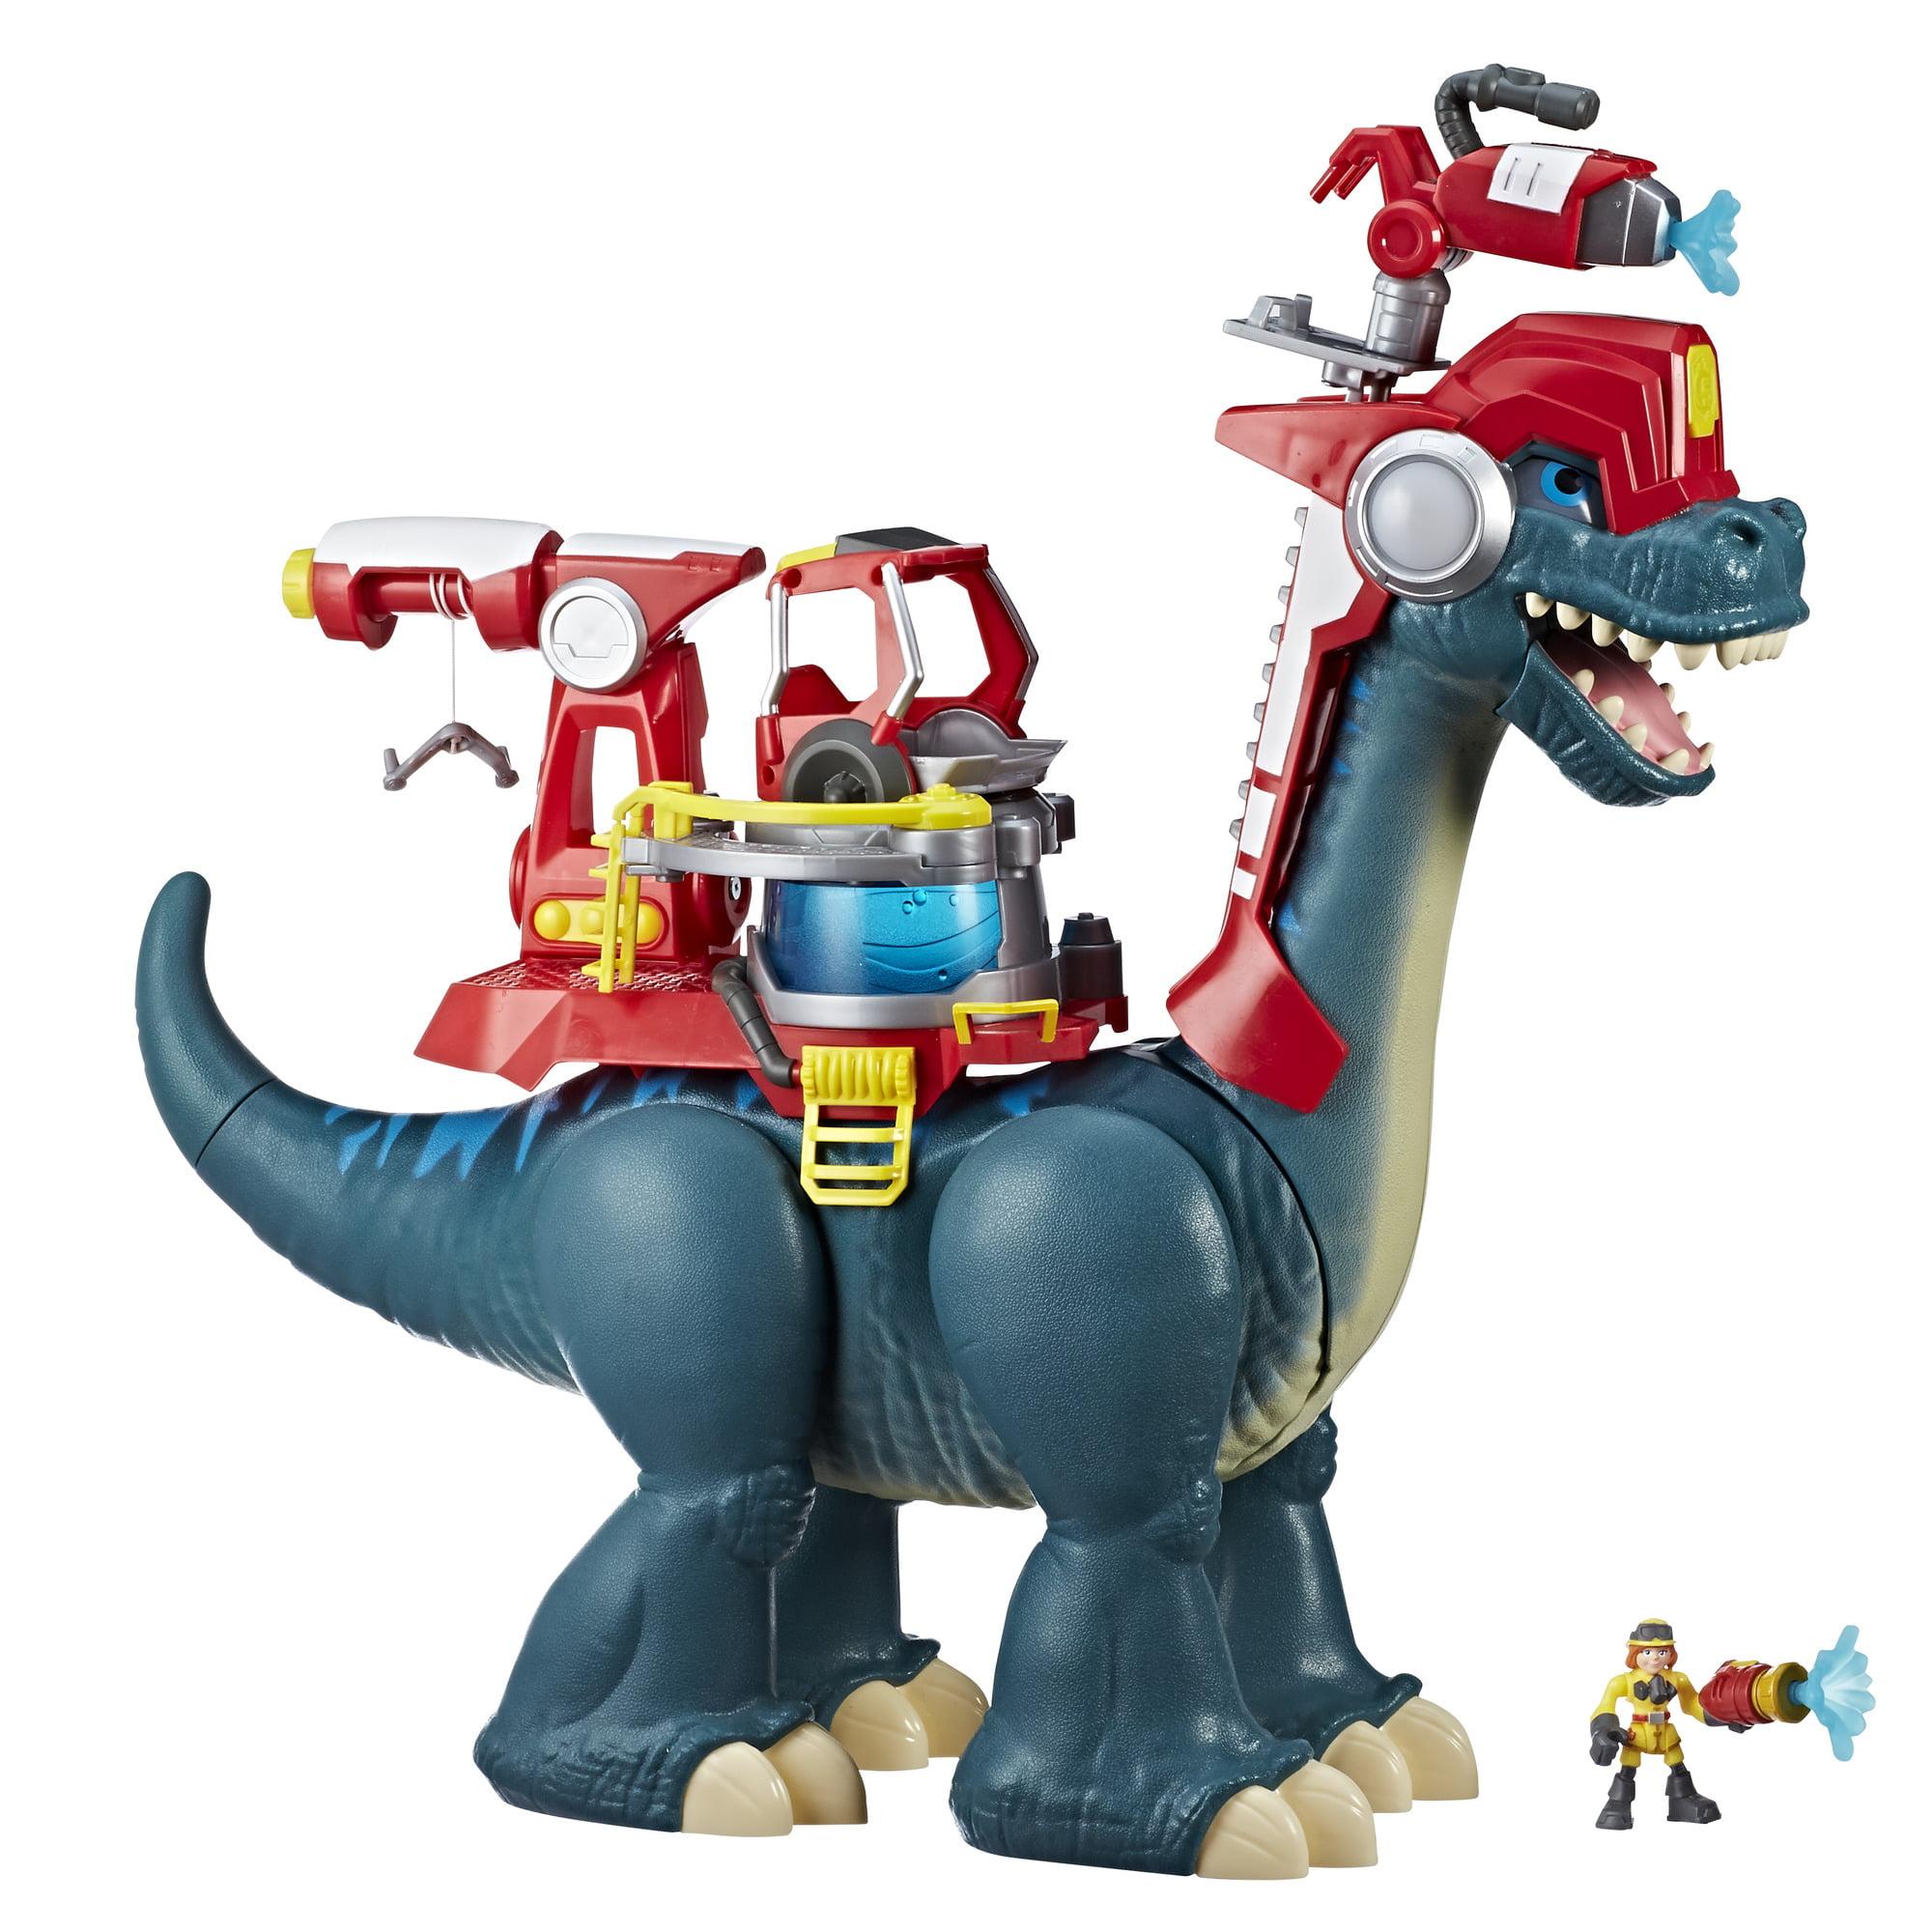 Playskool Heroes Chomp Squad Blazeasaurus and Sparks McKenzie by Hasbro Inc.